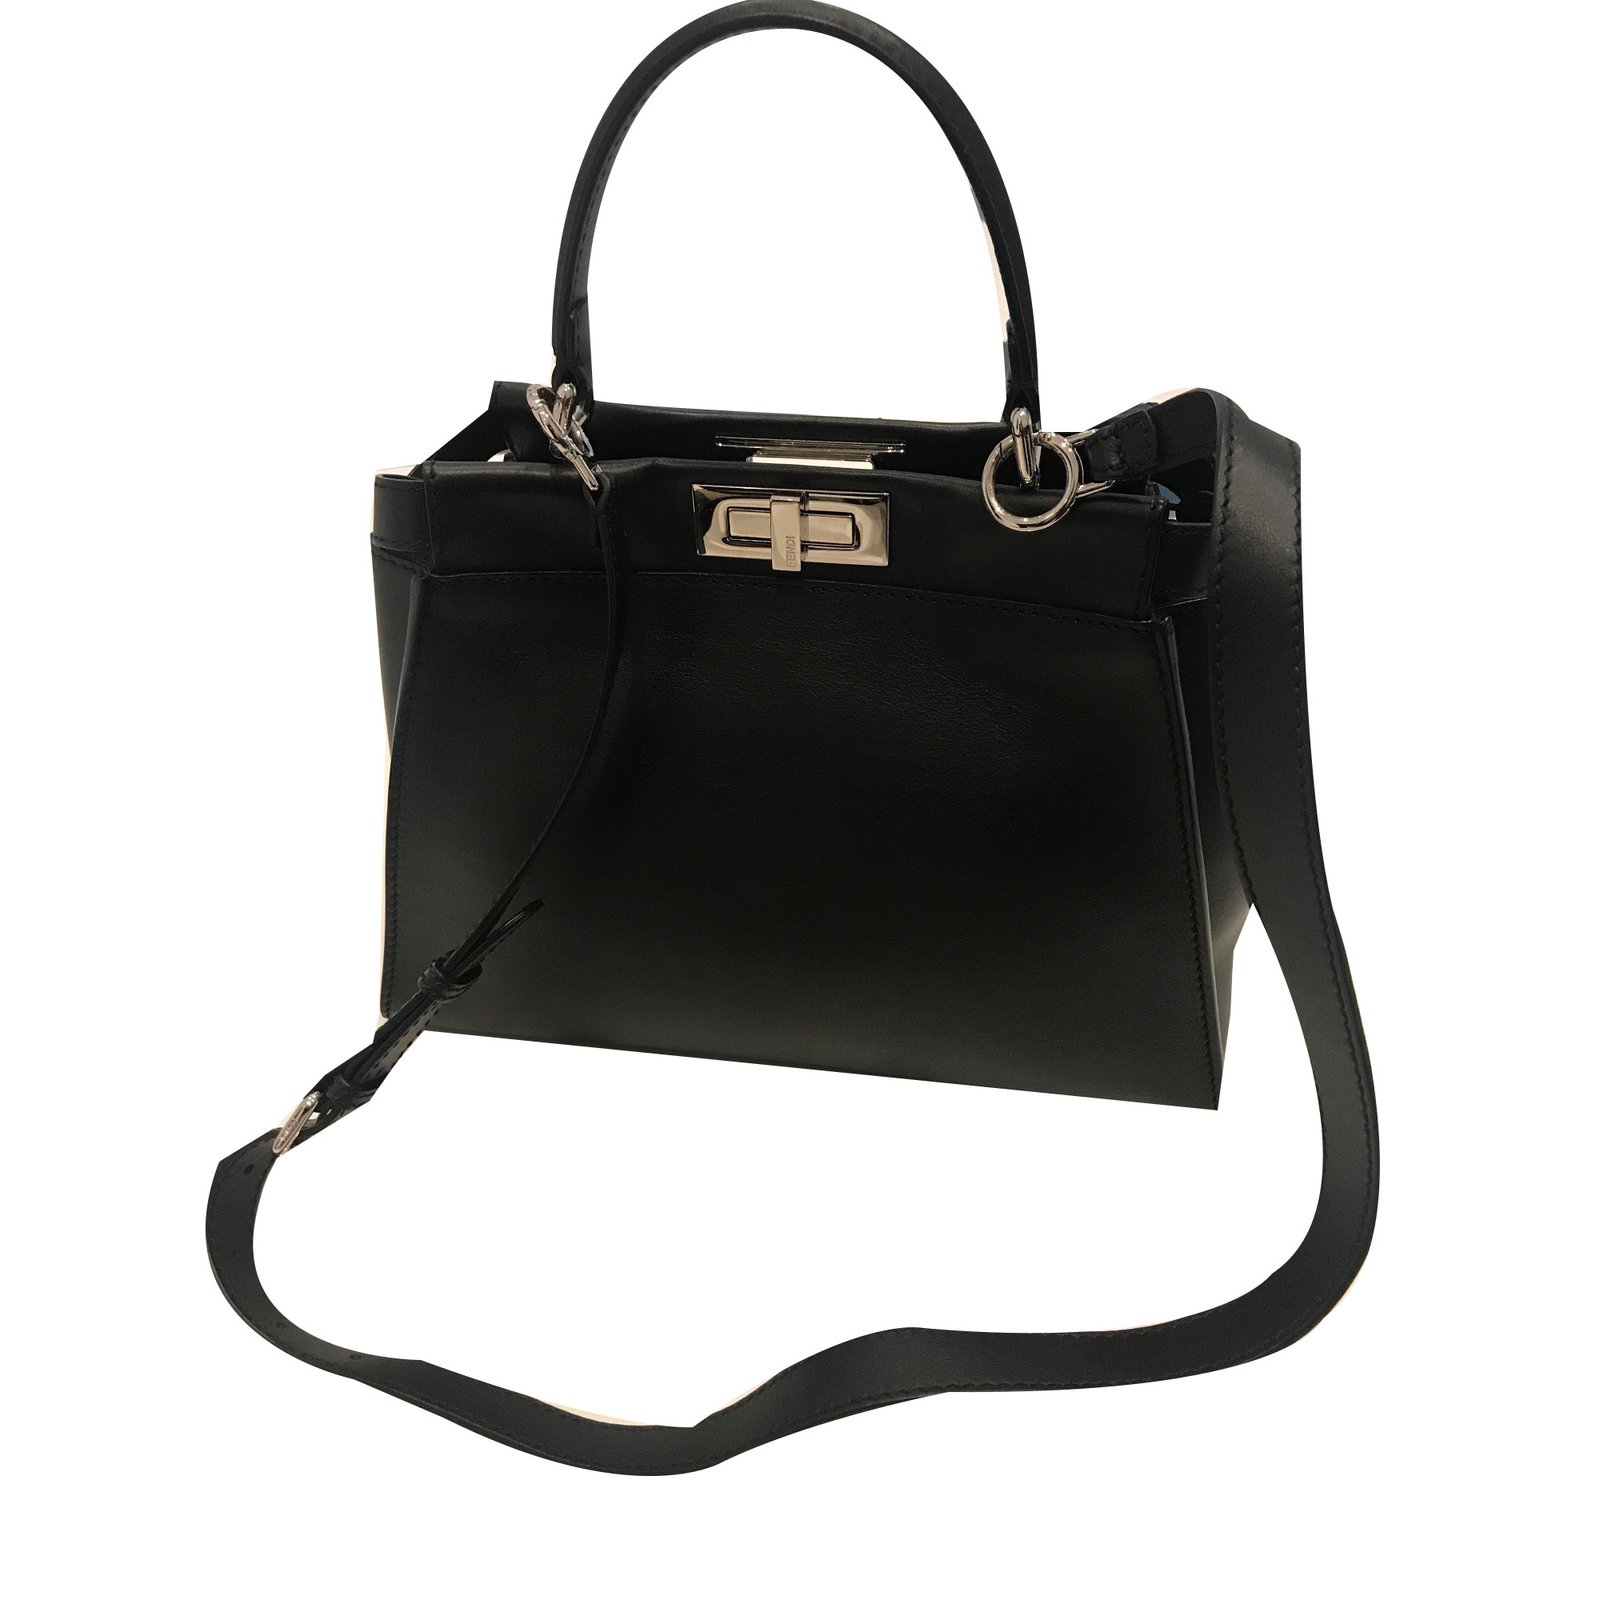 Fendi Peekaboo Handbags Leather Black ref.54969 - Joli Closet 1d2ea6795f1a6